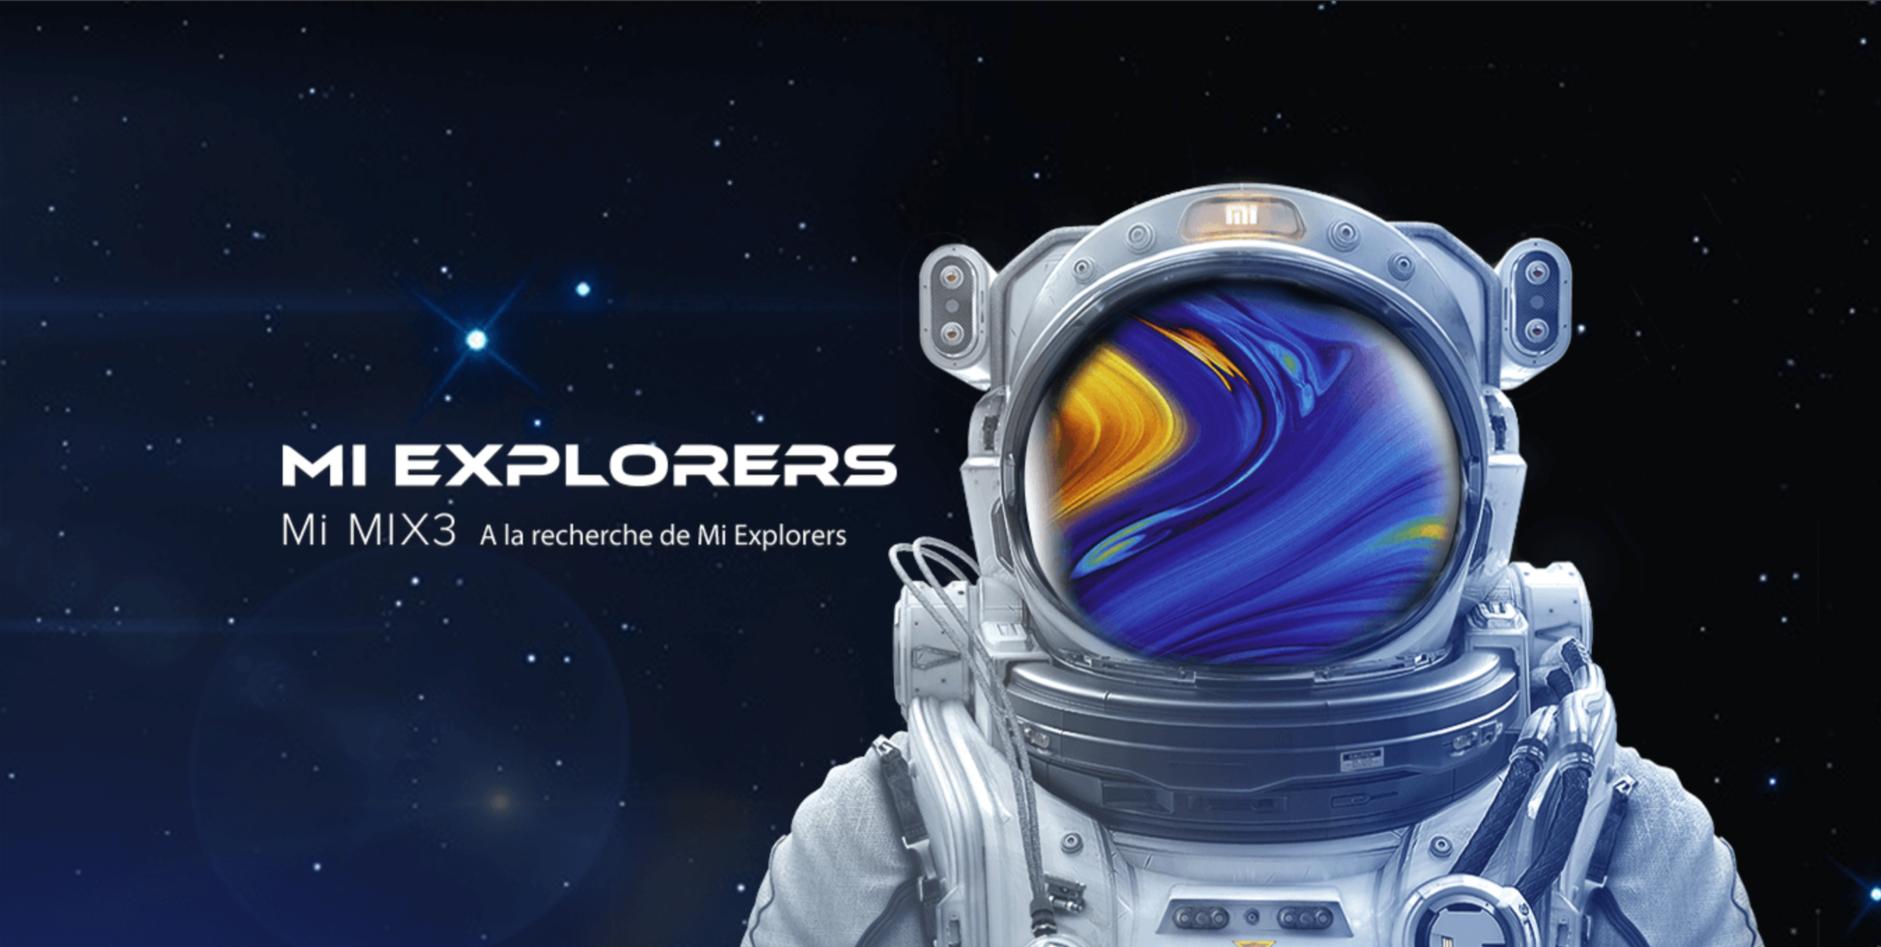 Mi Explorer Edition Mi MIX 3 arrive !!